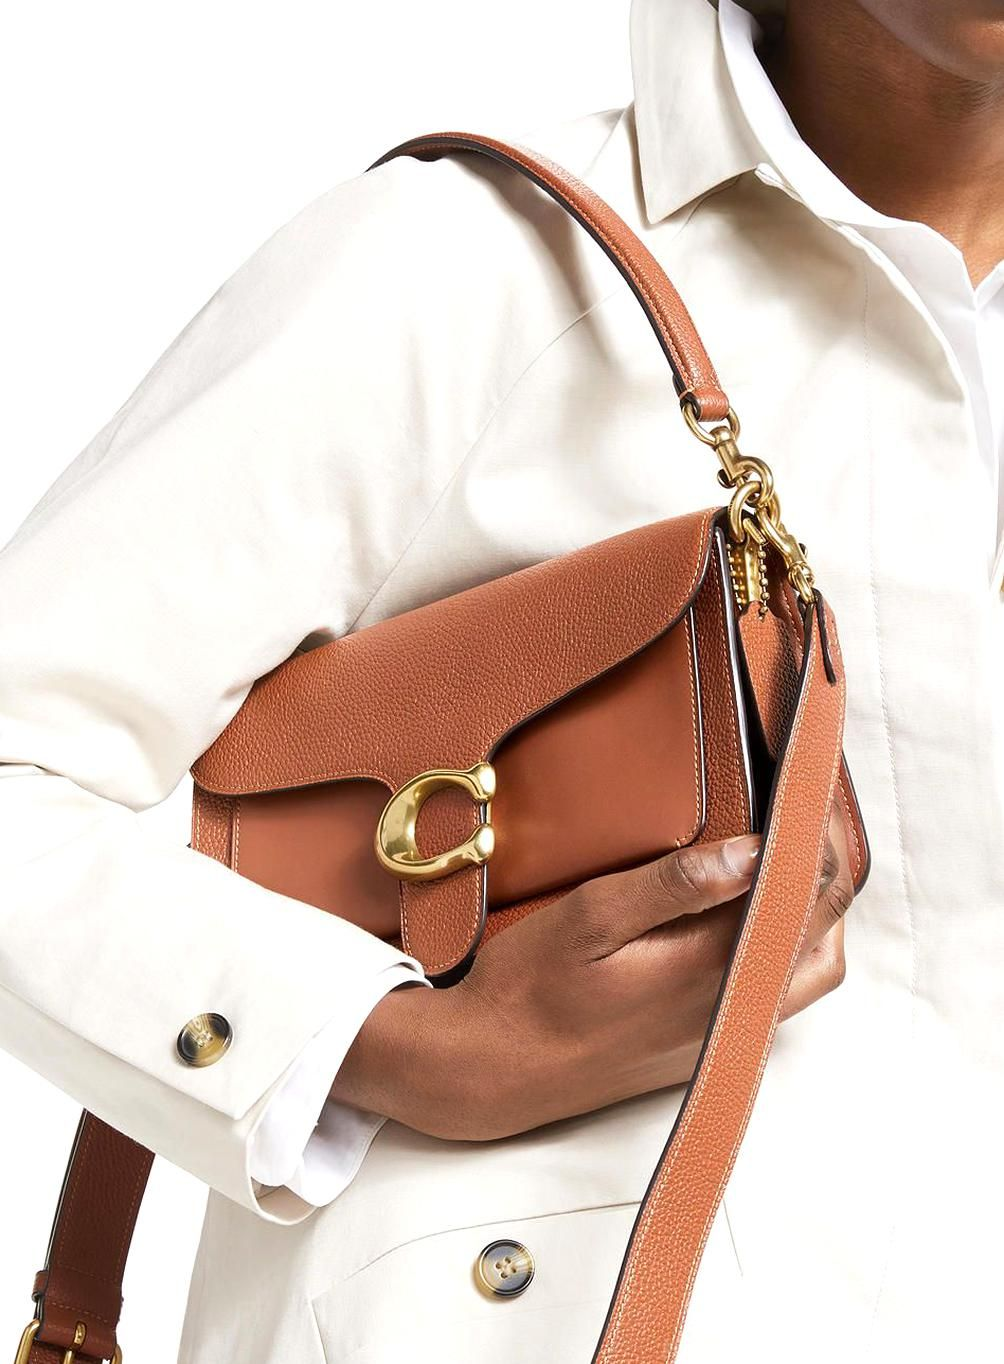 Pin on Wonderful bags